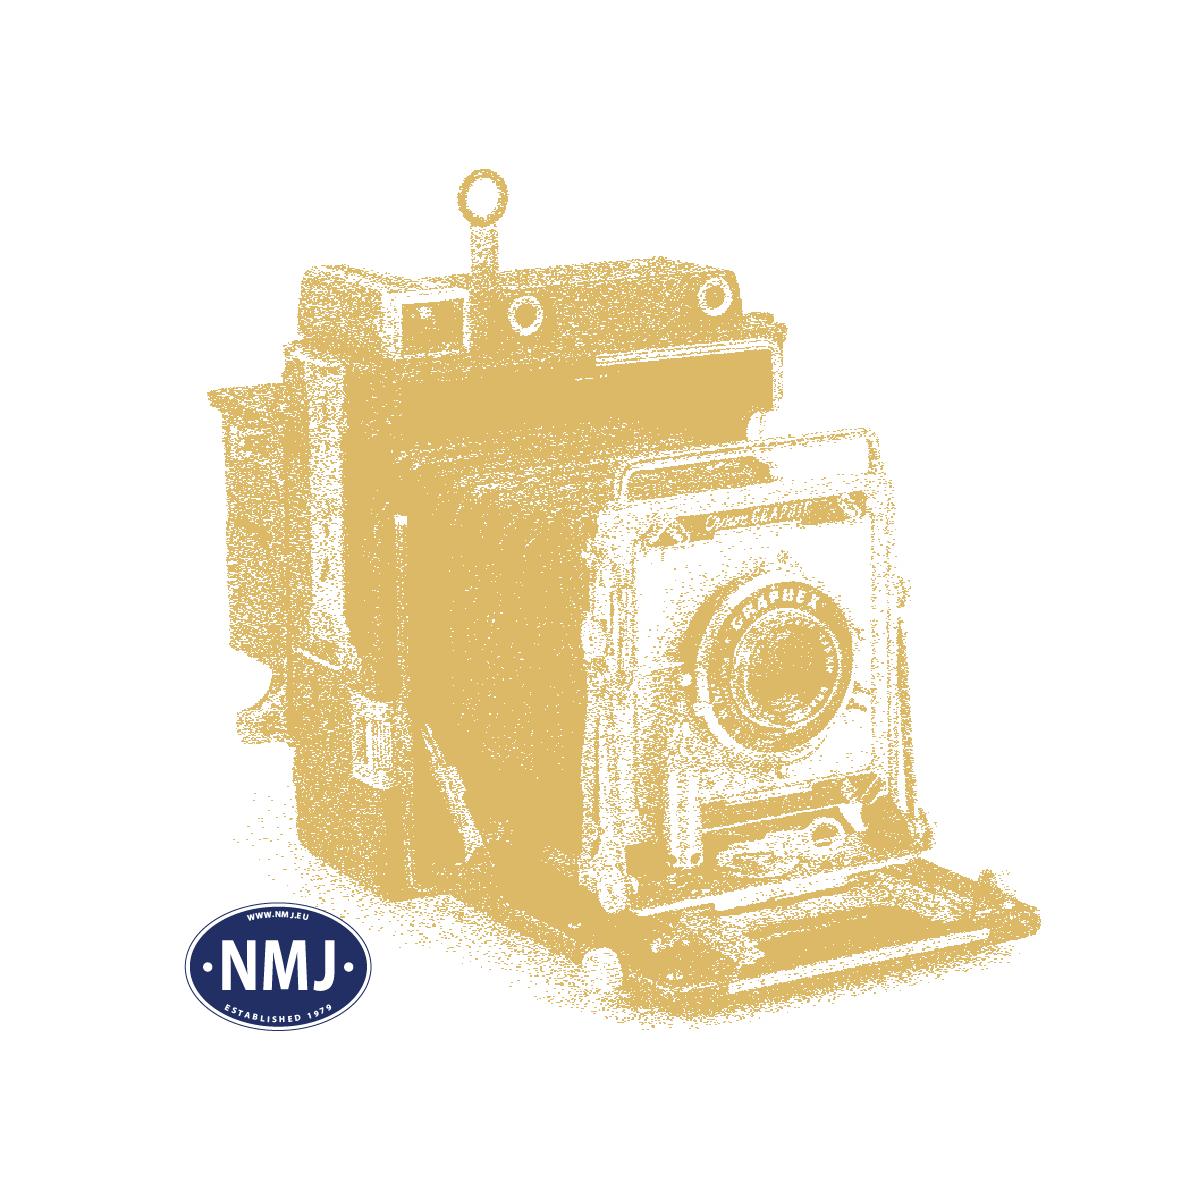 NMJT145004 - NMJ Topline der NSB Di3.643, Rot/Silber, DCC m/ Sound, Spür 0